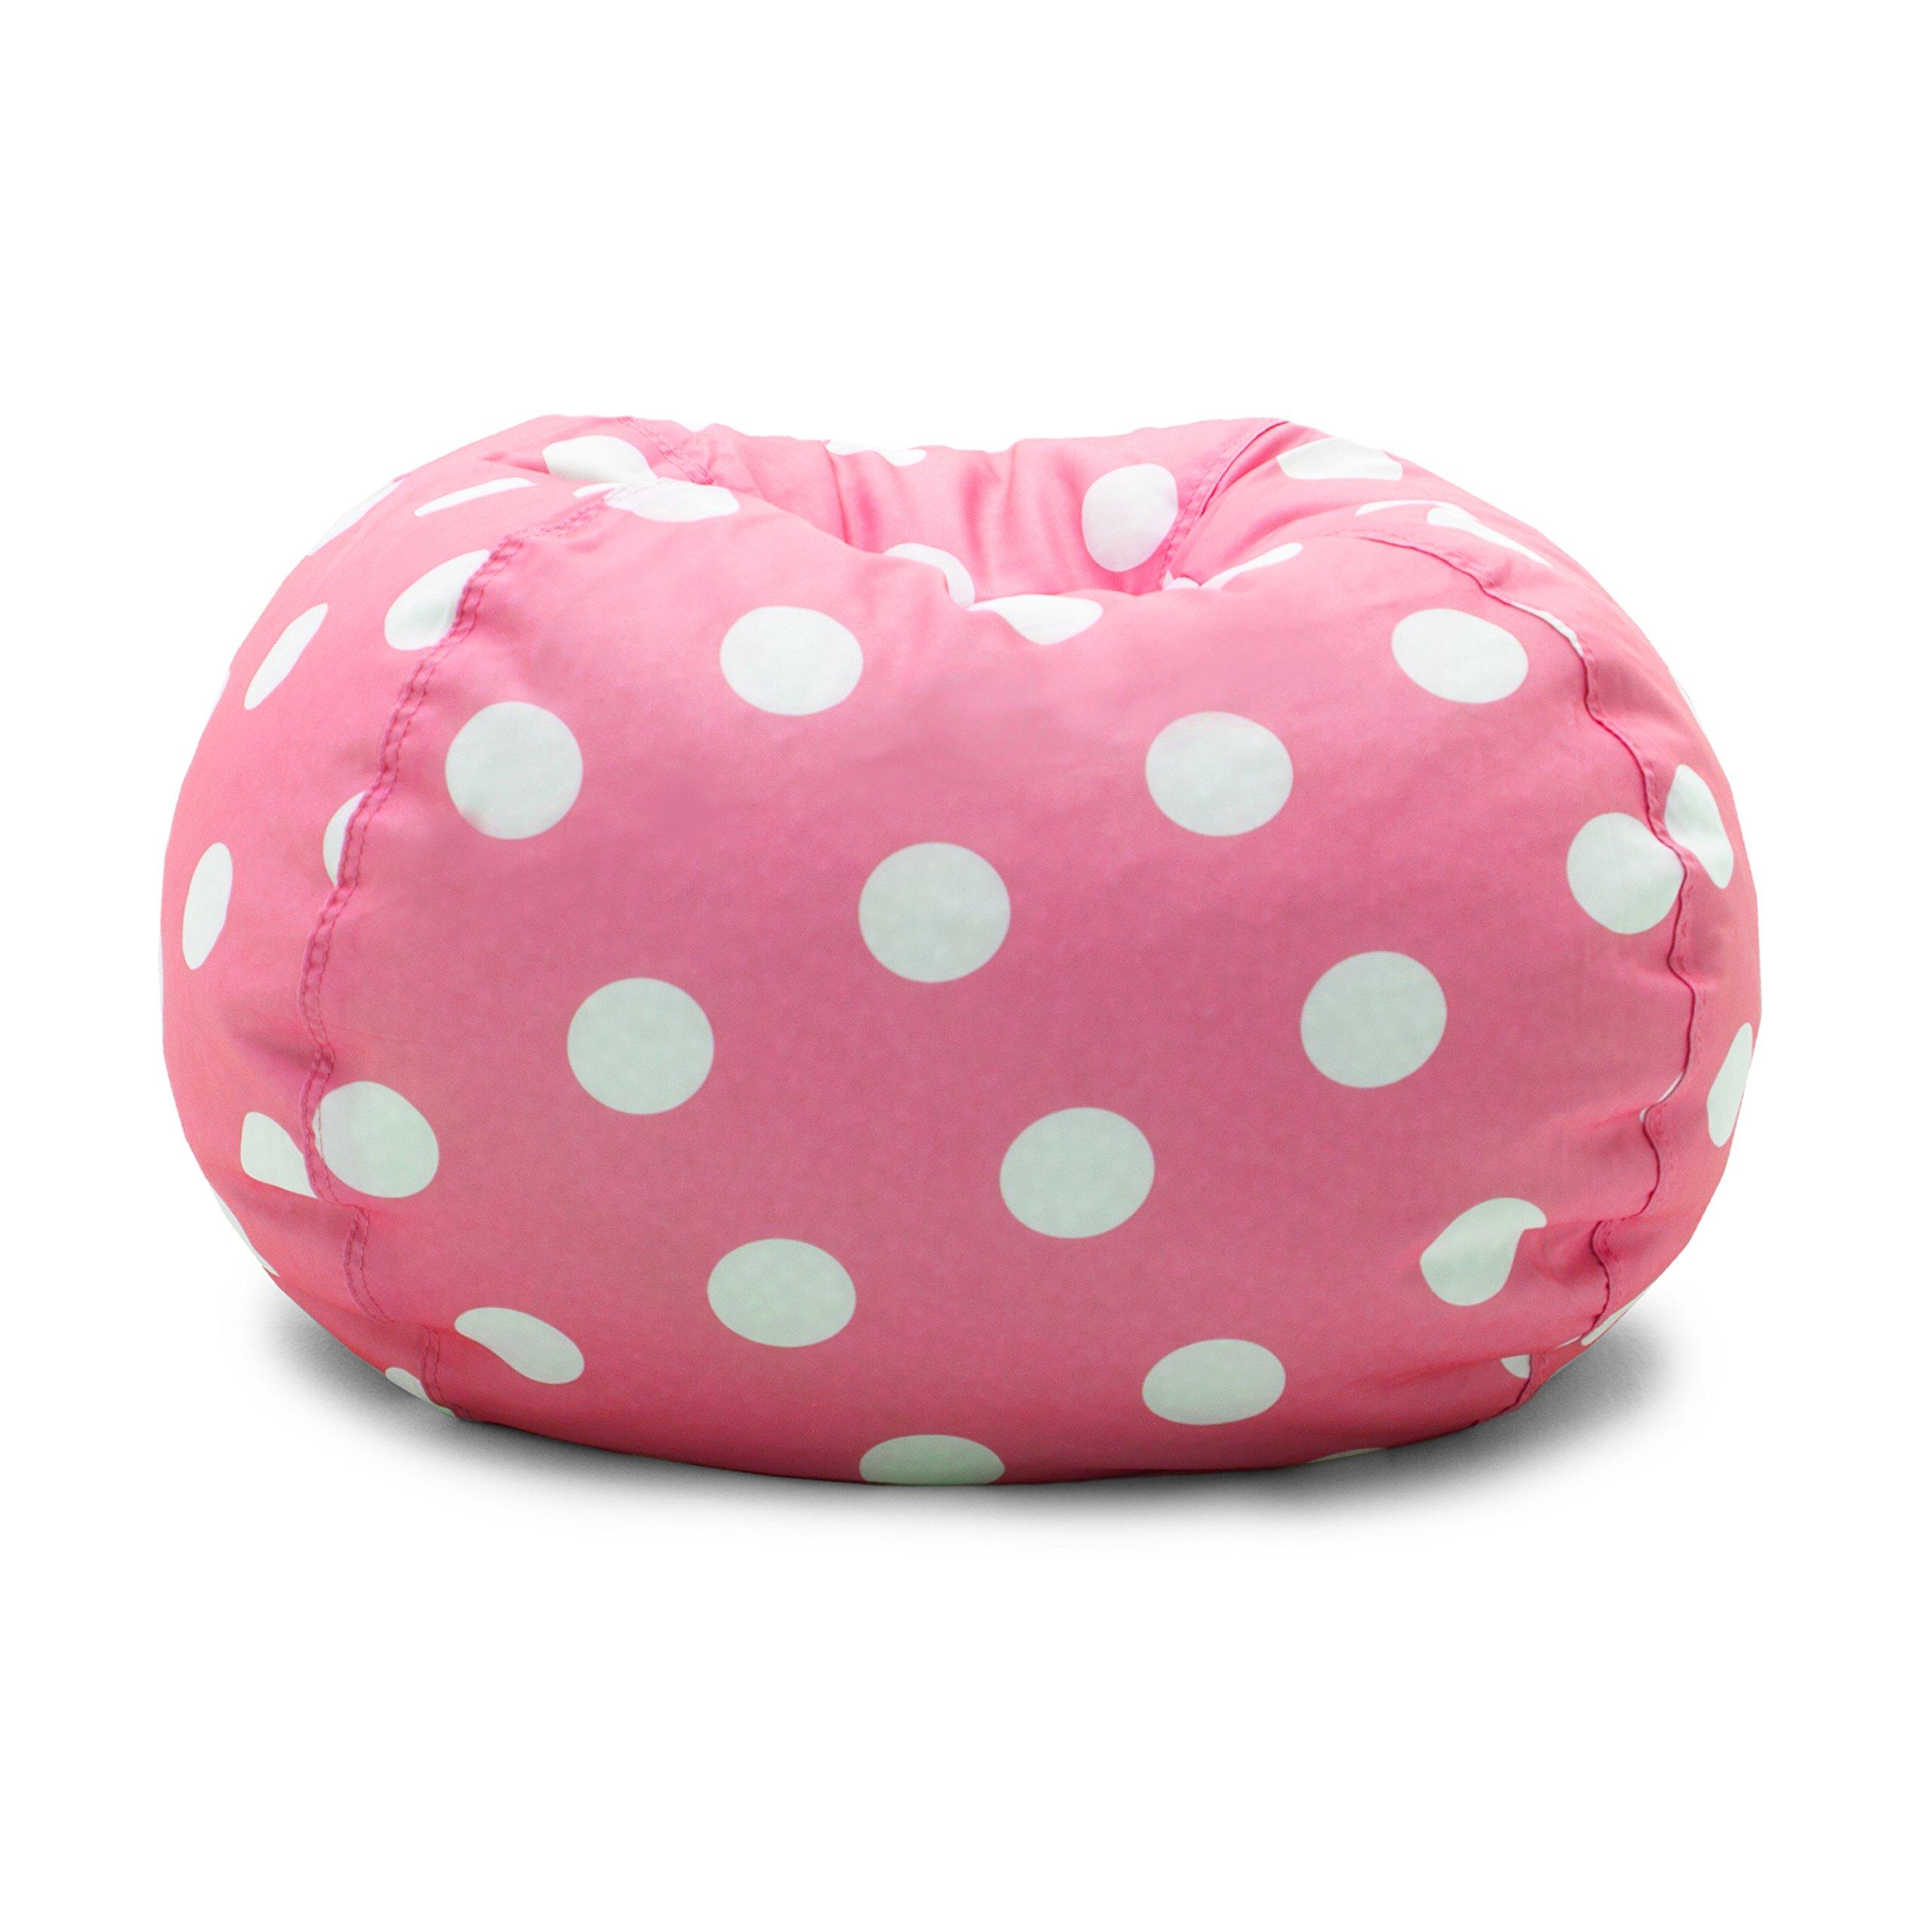 Big Joe Classic Bean Bag Chair, Candy Pink Polka Dot